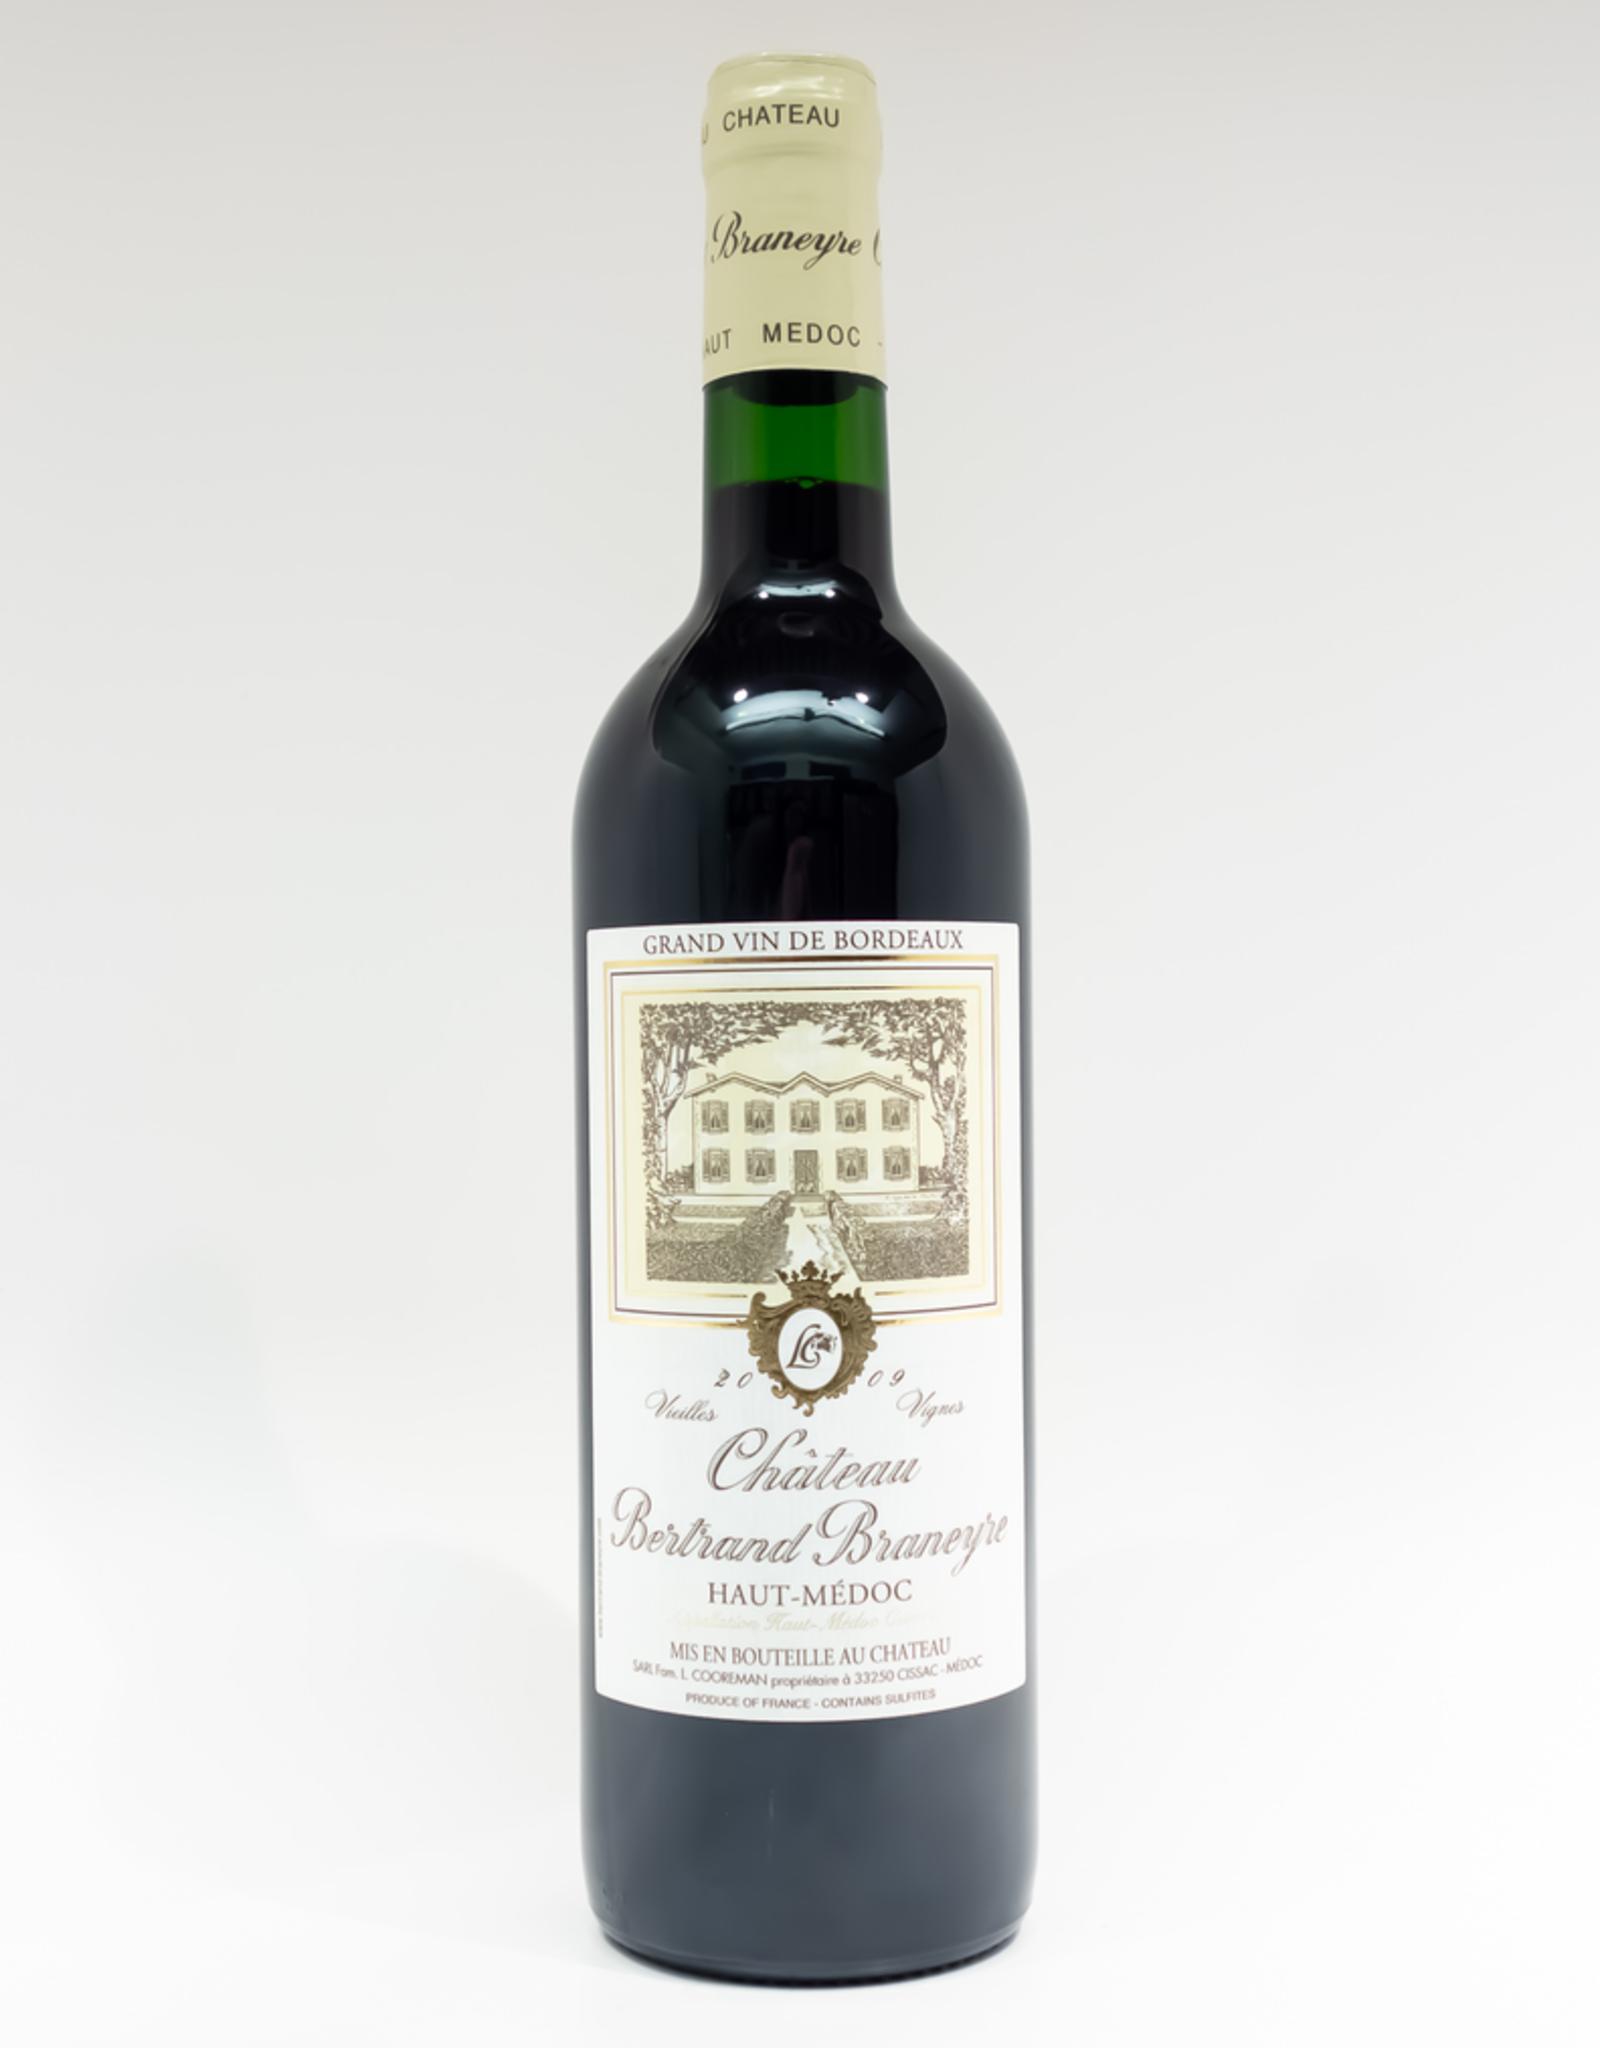 Wine-Red-Lush Chateau Bertrand-Braneyre Haut-Medoc AOC 2009